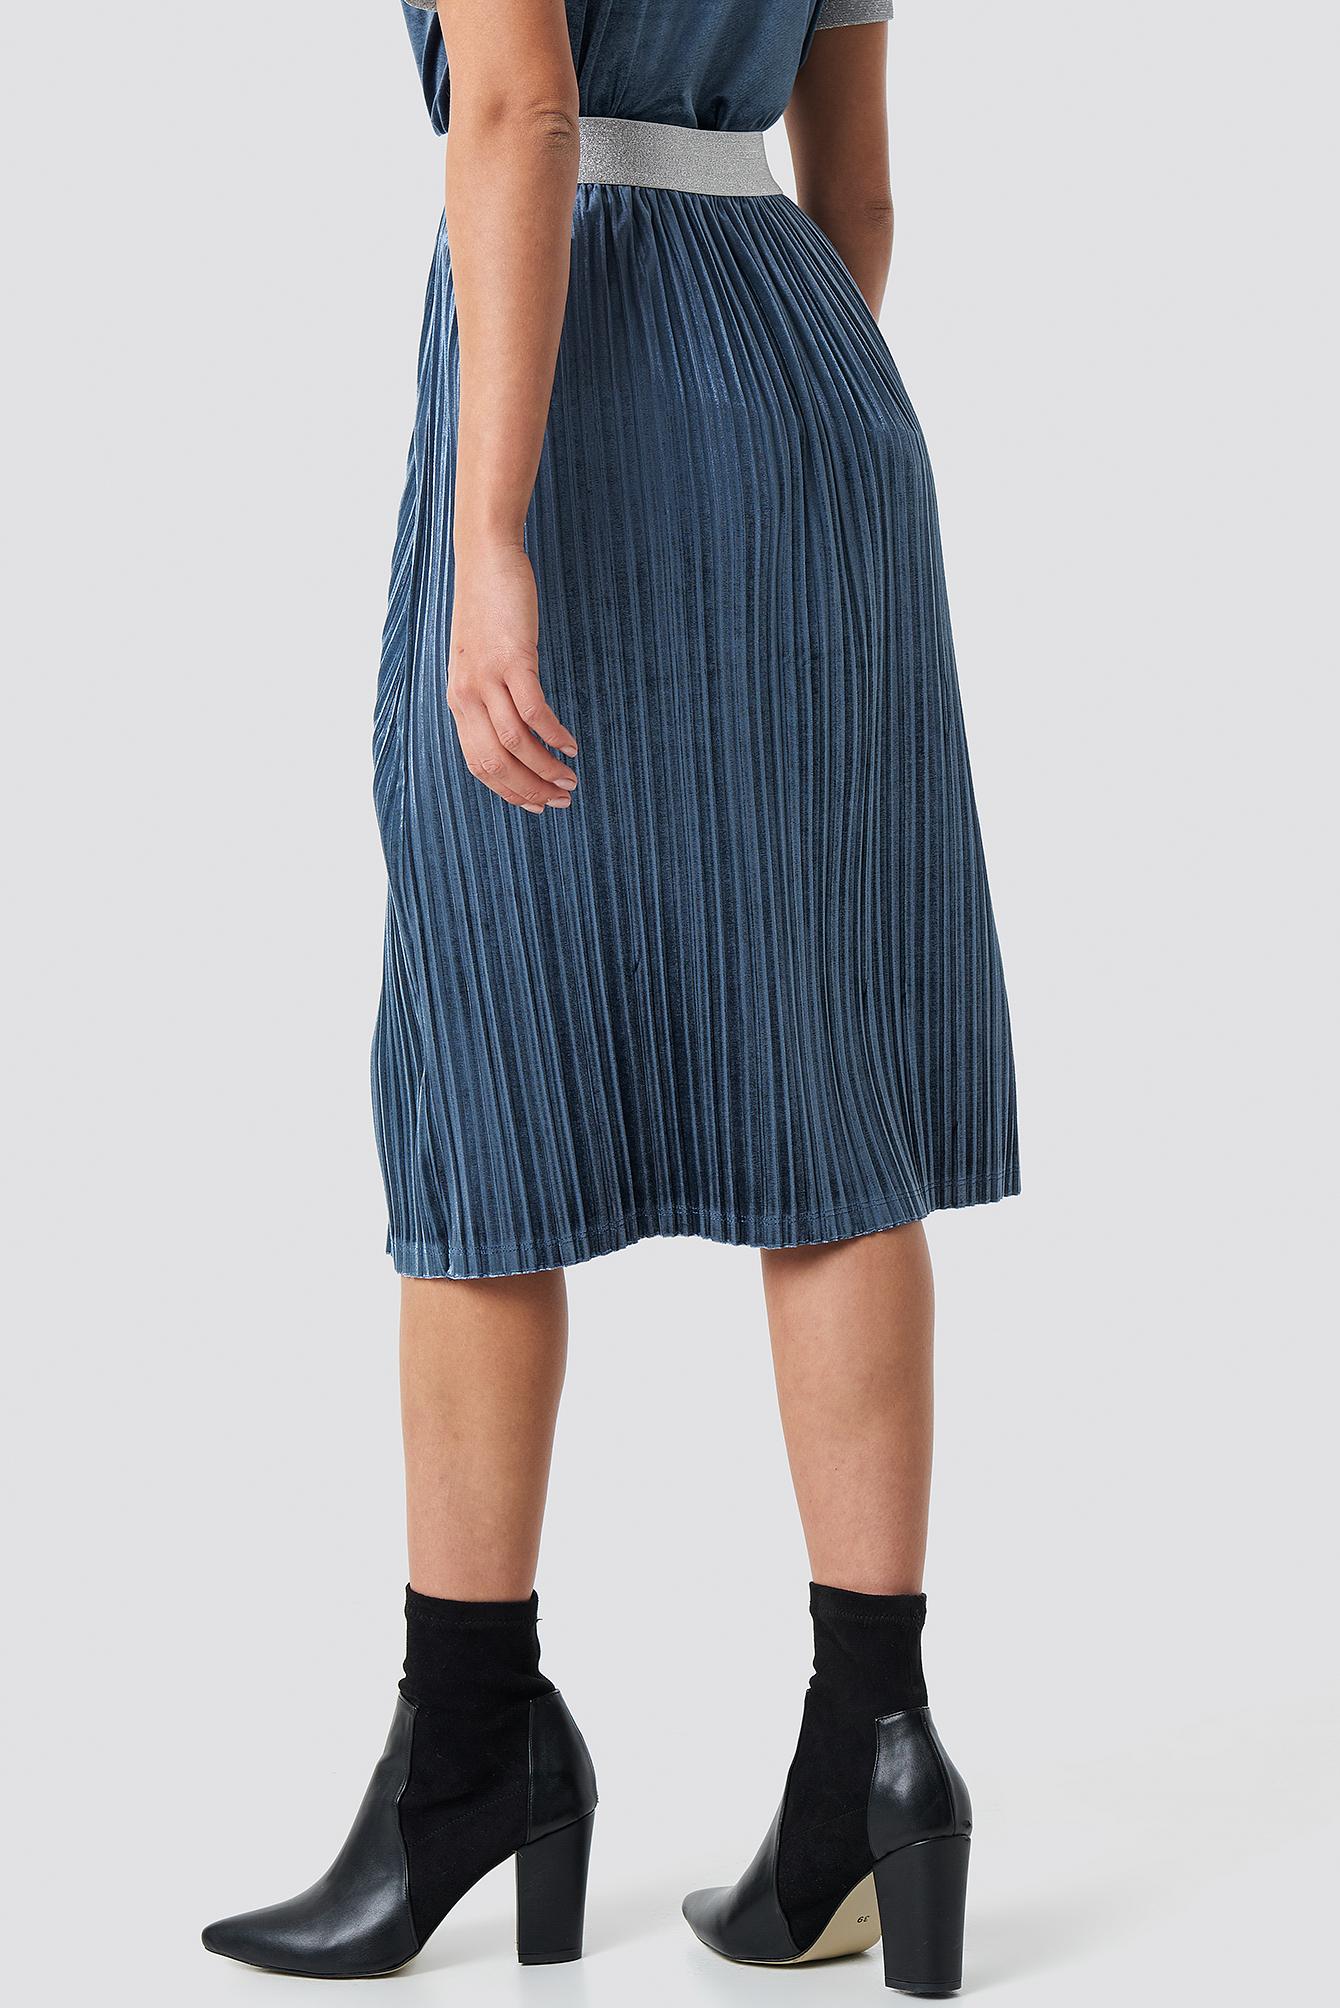 Saint Skirt NA-KD.COM